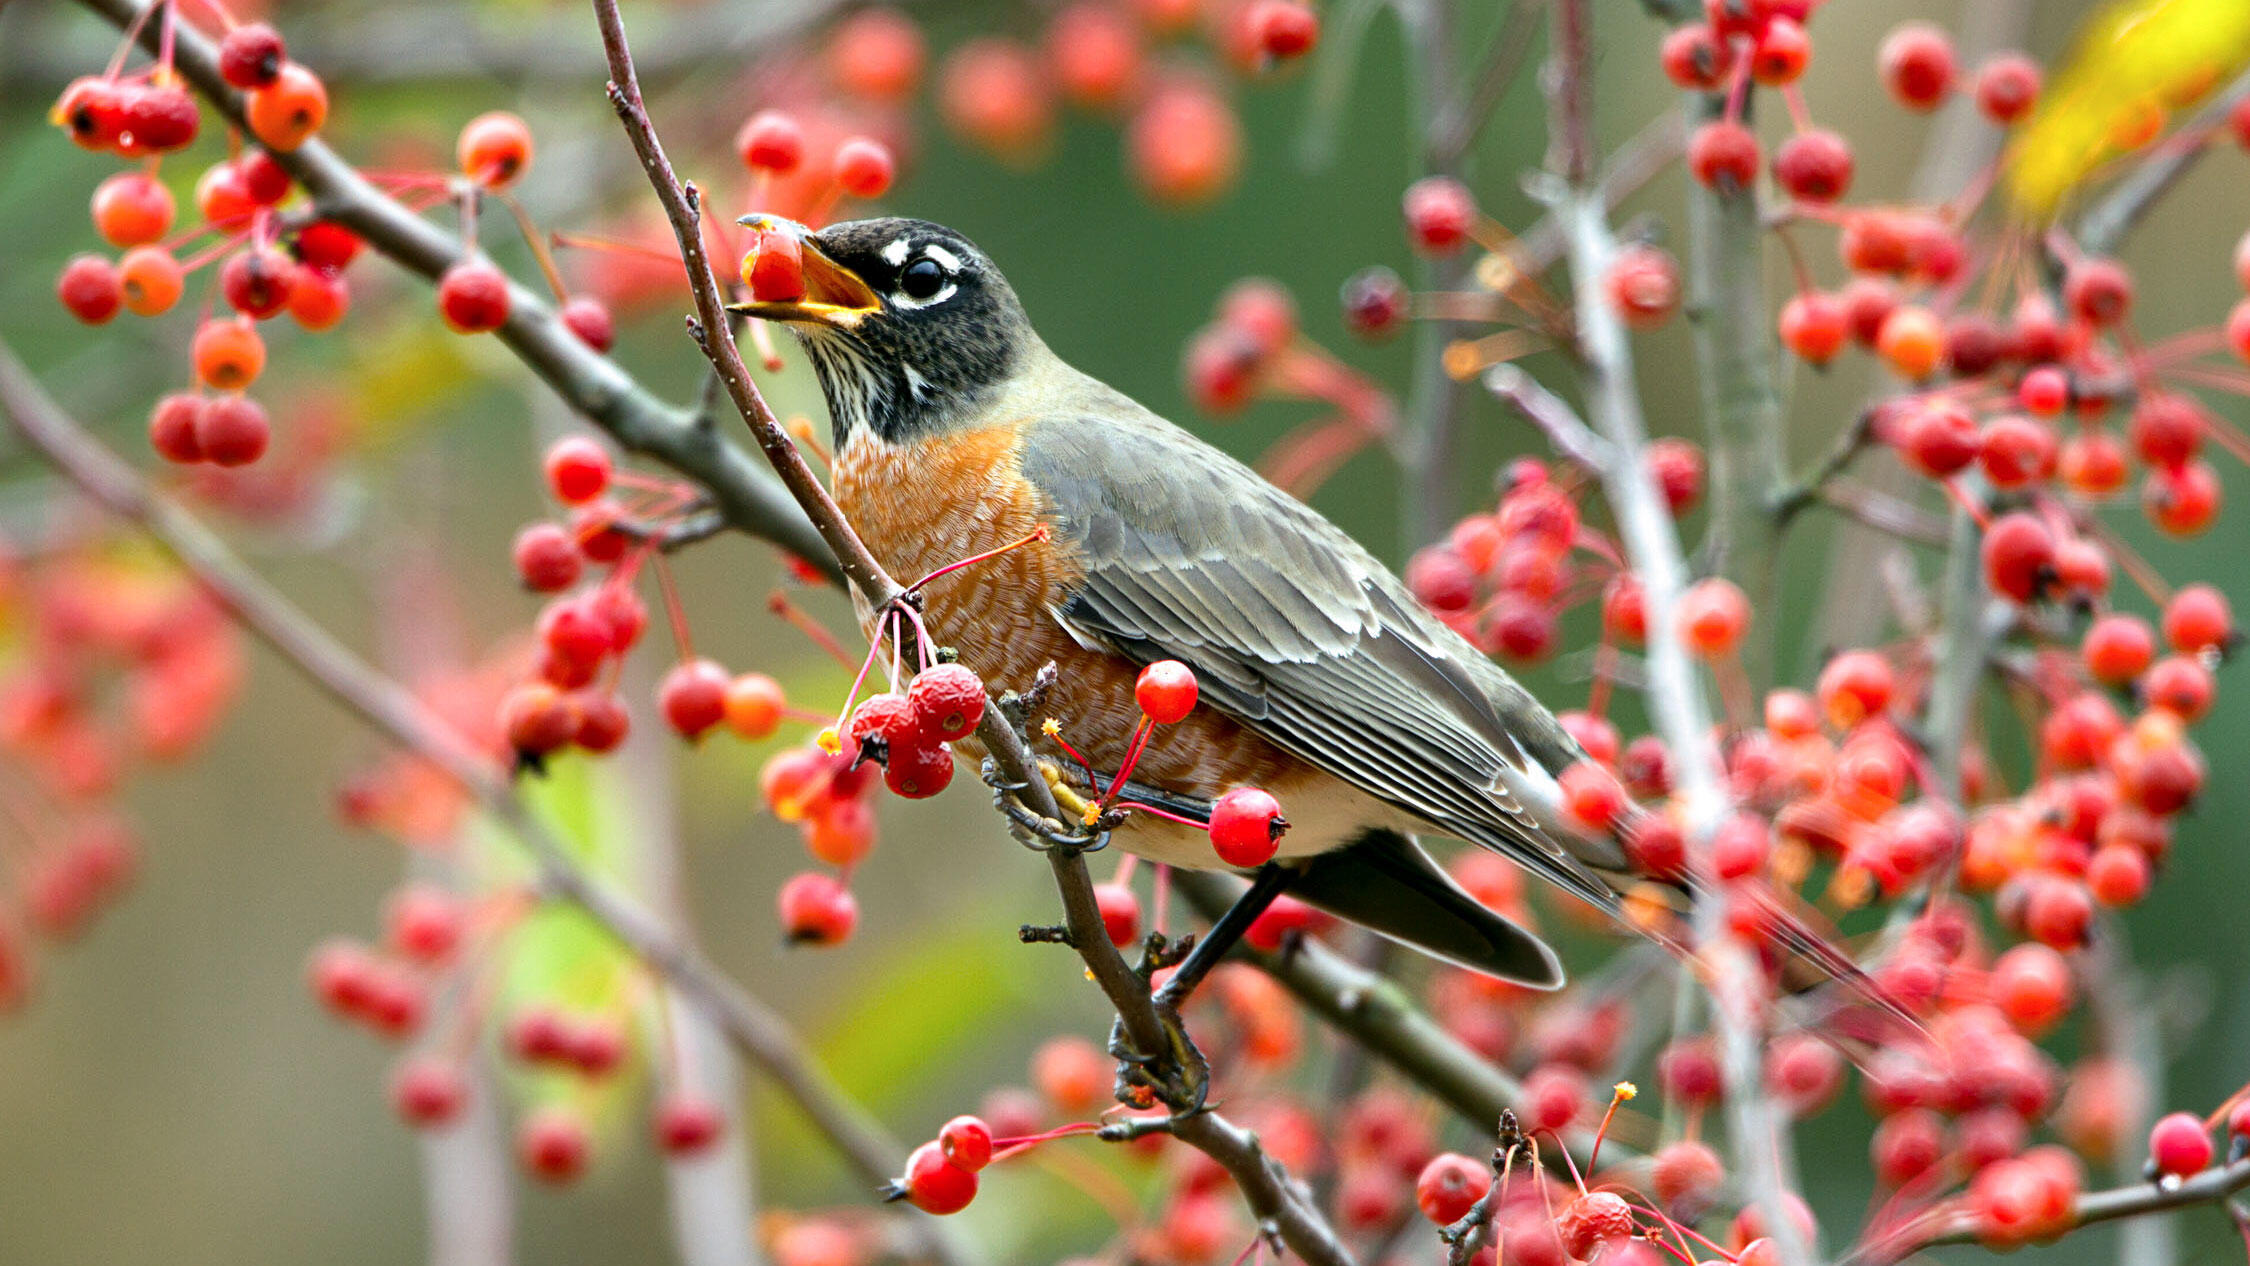 American Robin in a crab apple tree. Dave Maslowski